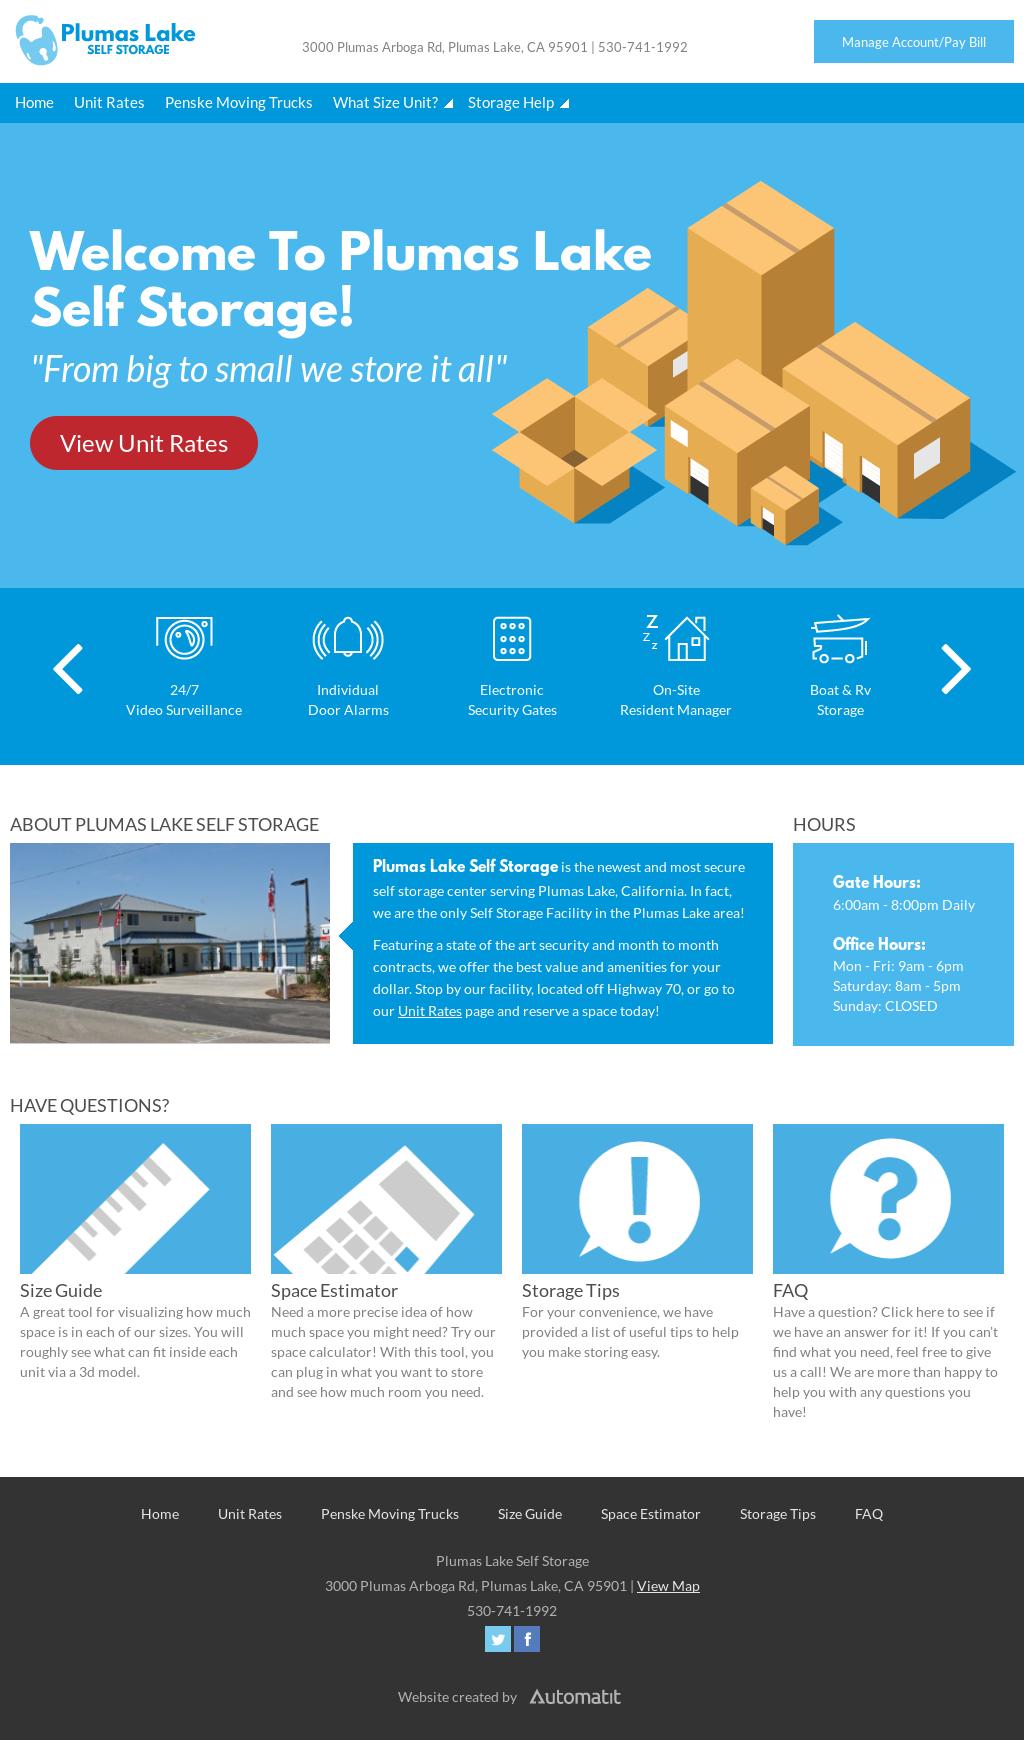 Plumas Lake Self Storage Website History